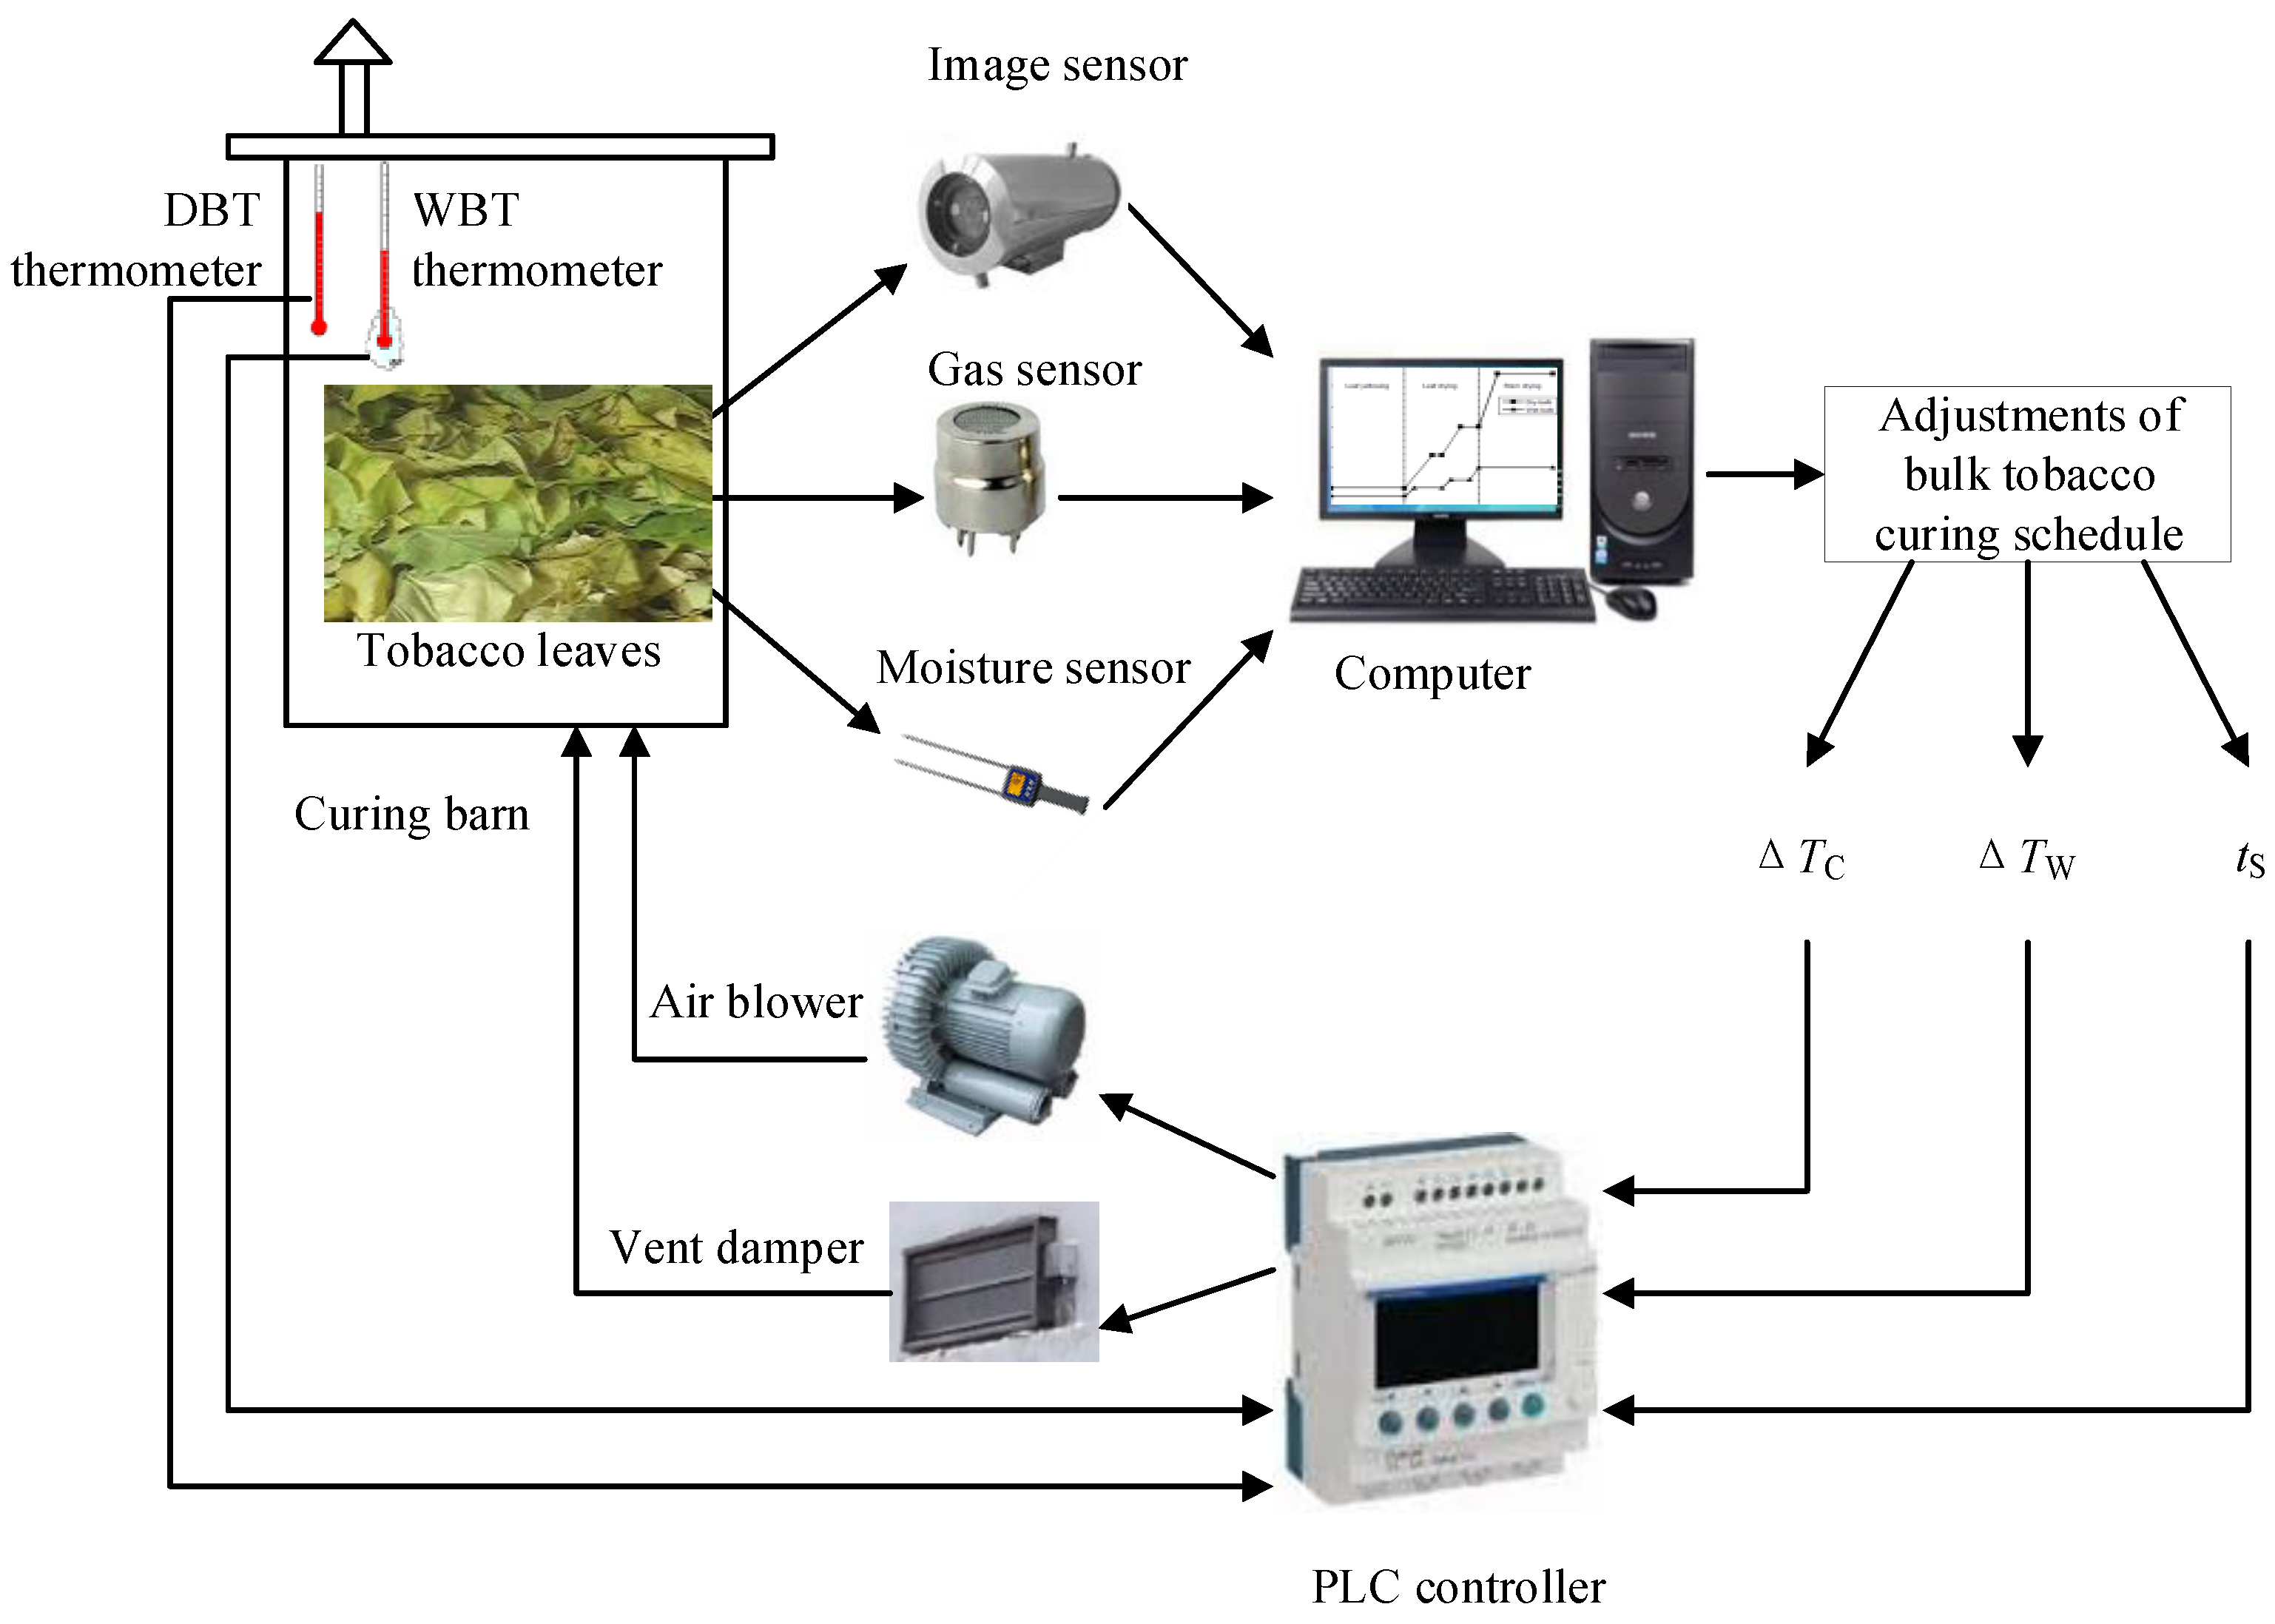 Sensors | Free Full-Text | Intelligent Control of Bulk